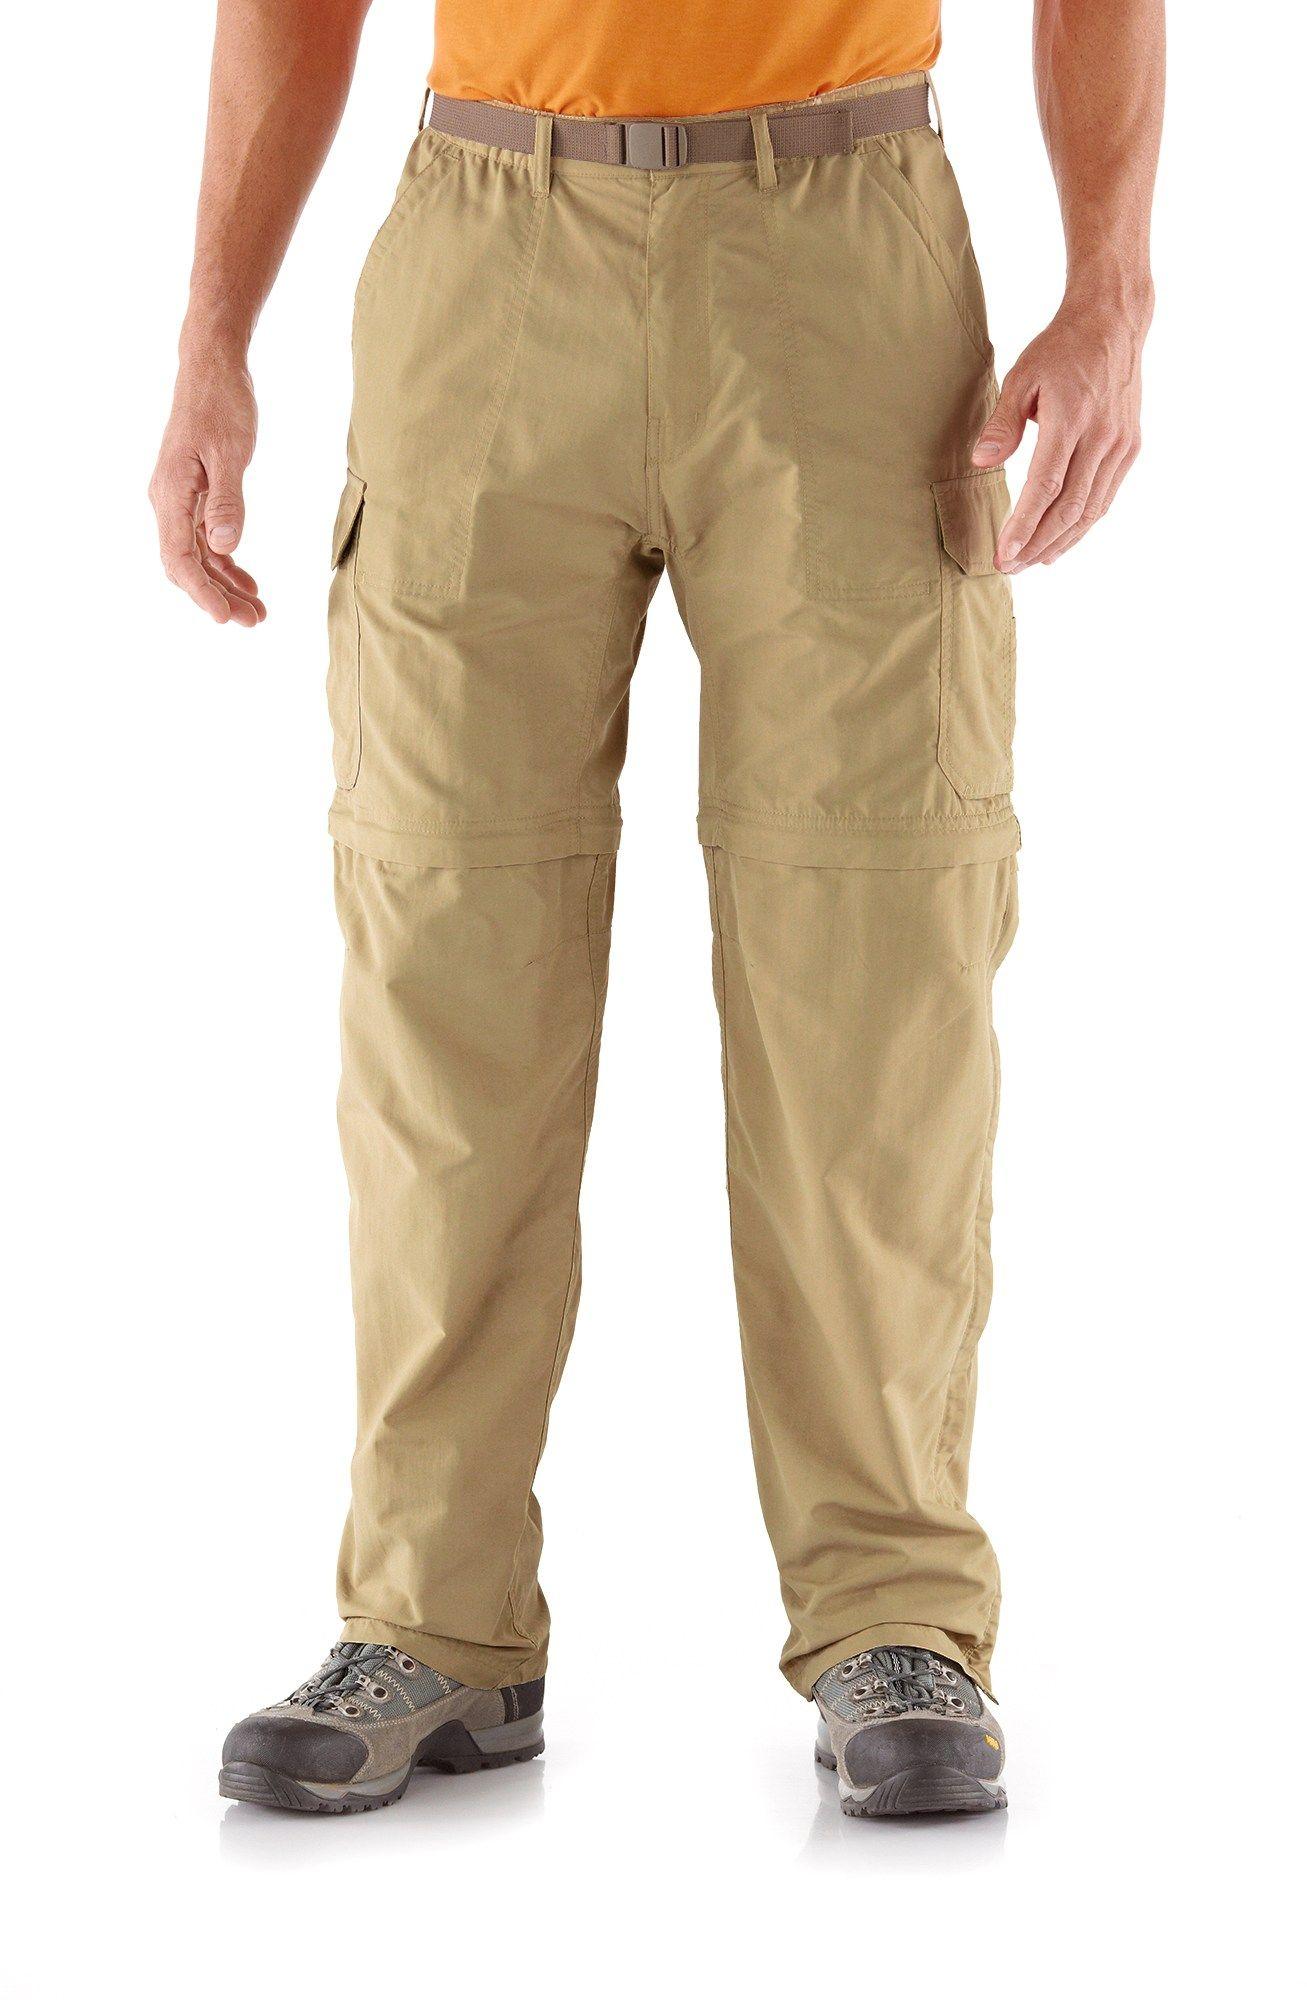 6c9f7b35771358 REI Sahara Convertible Pants with No-Sit Zips - Men s 30